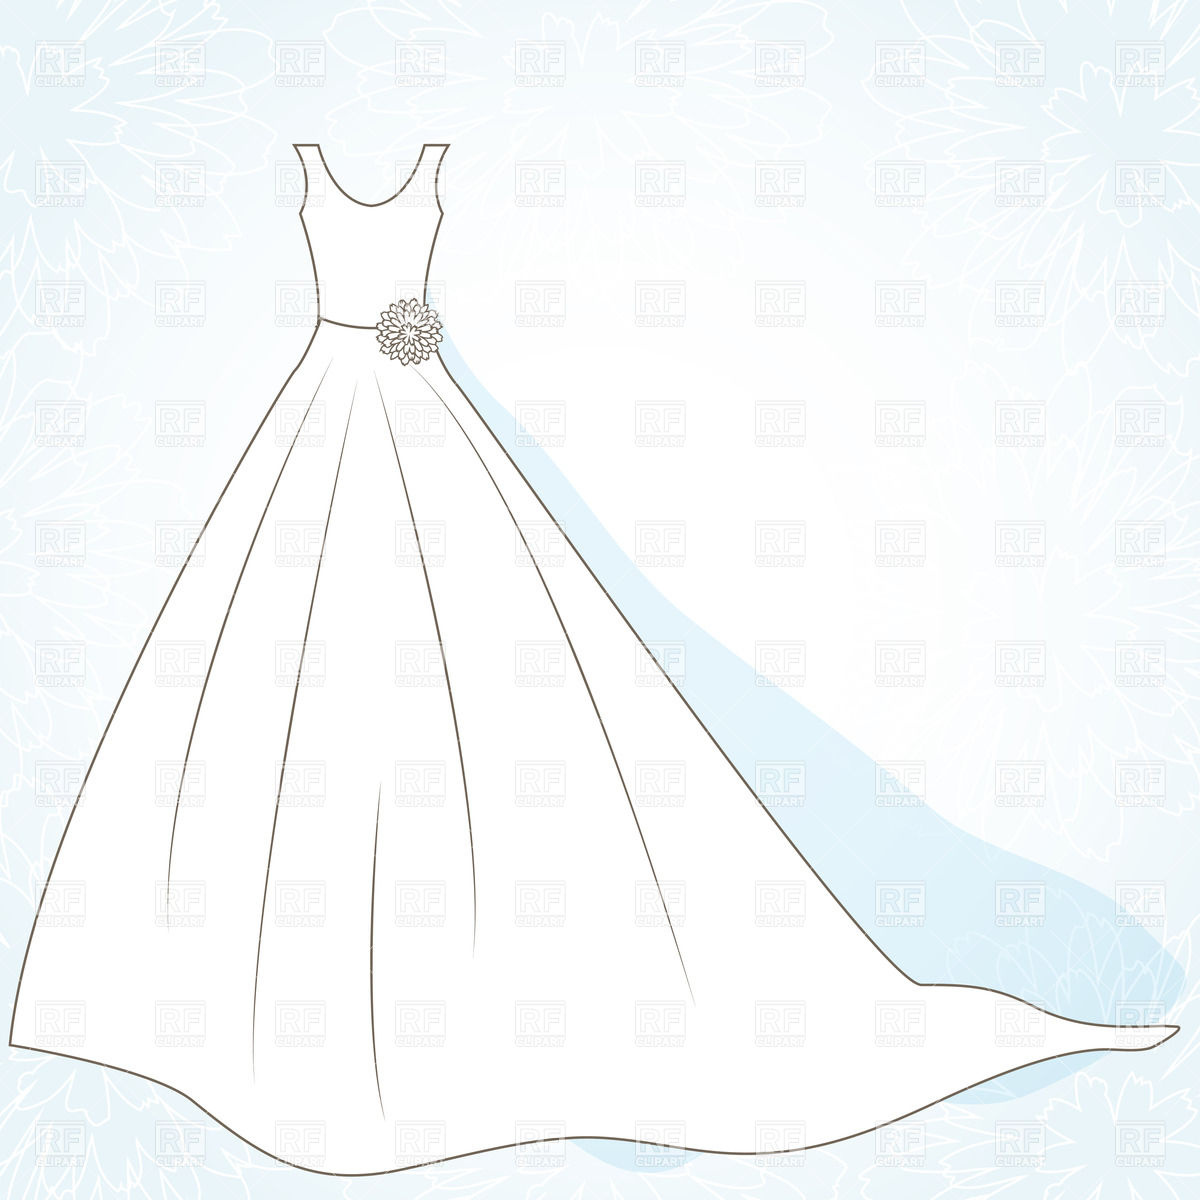 Clipart Wedding Dress Clipart ClipartFes-Clipart Wedding Dress Clipart ClipartFest-11